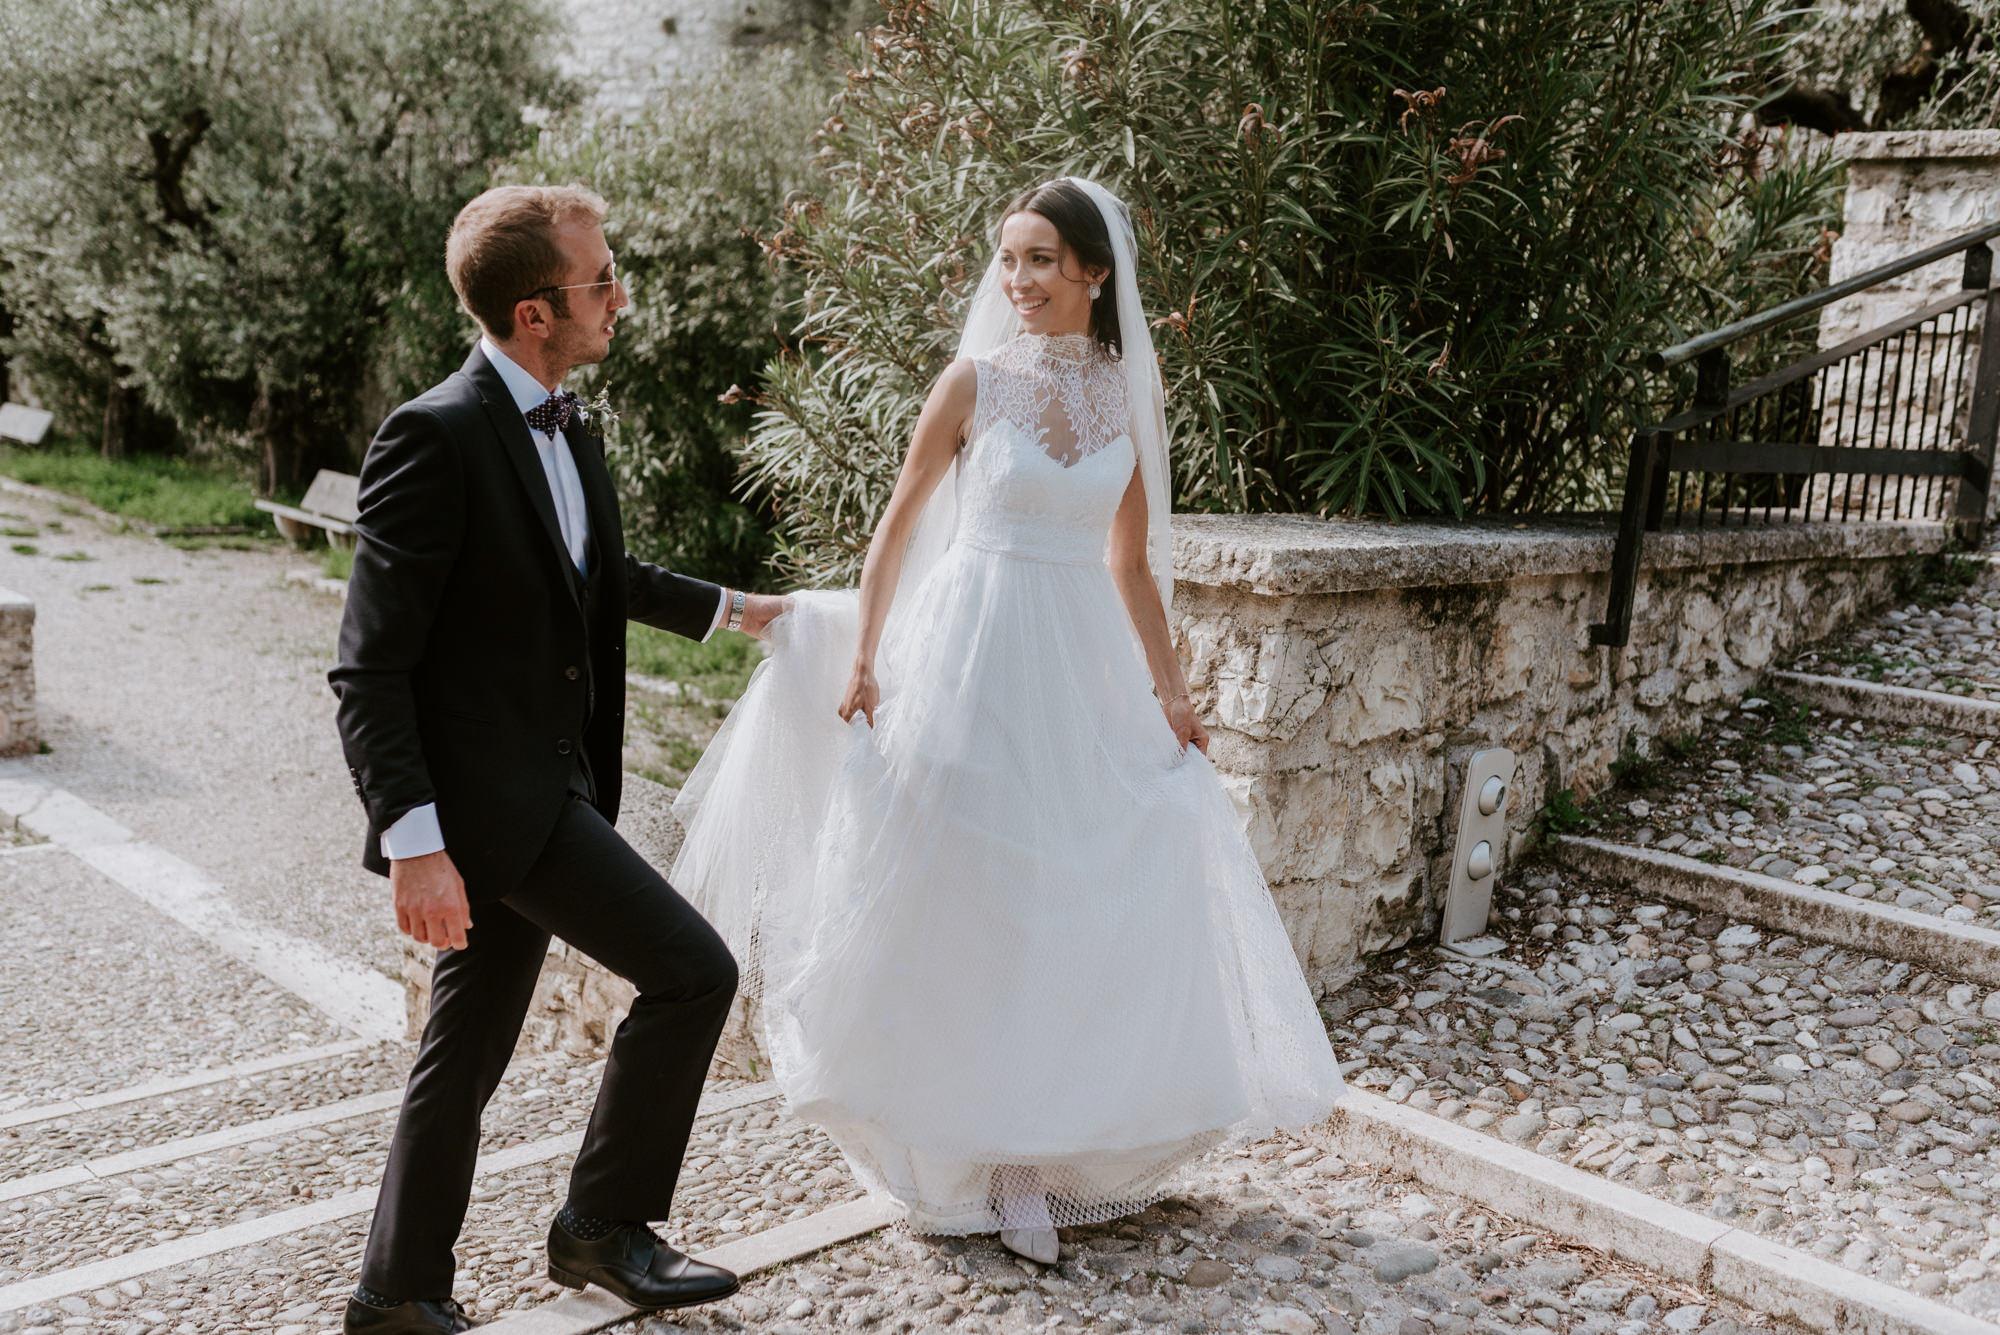 FOTO+PHOTO+BODA+WEDDING+ITALIA+ITALY+MAURICIO+GARAY+MAURICIOGARAY+WEDDINPHOTOGRAPHER+FOTOGRAFODEBODA-1179.jpg